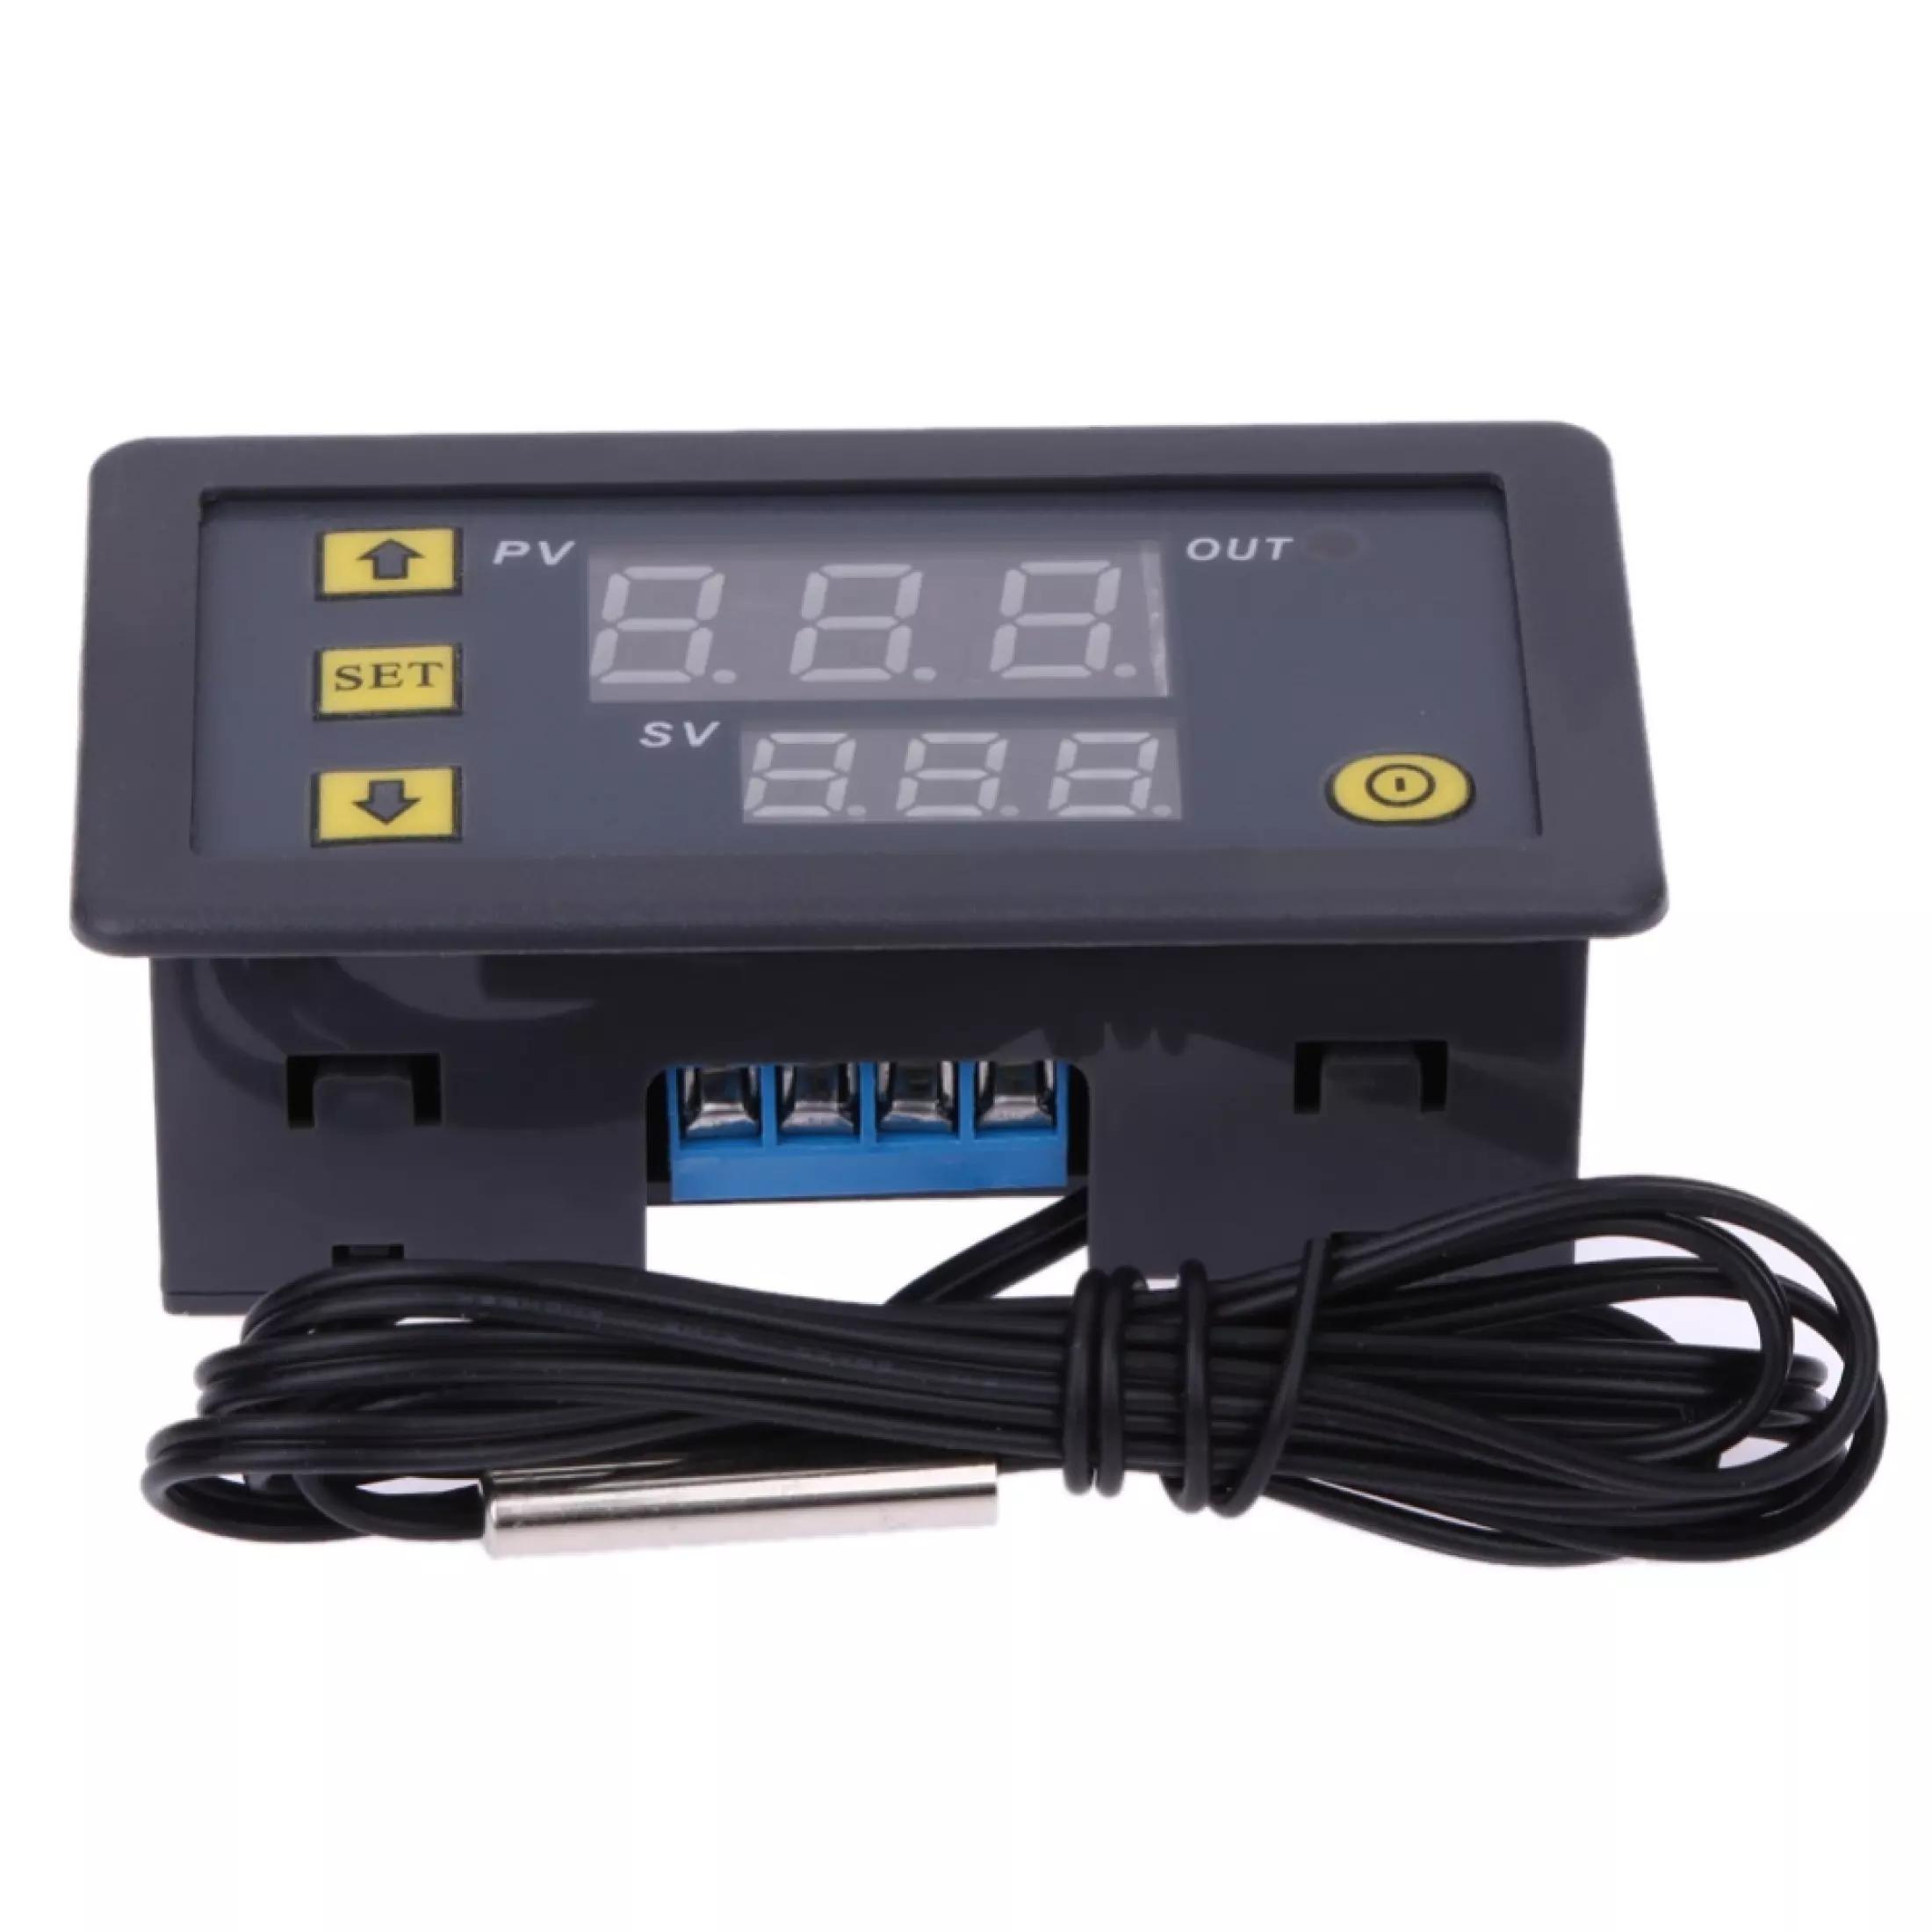 W3230 Digital  Thermostat Temperature Alarm Controller Sensor Meter Regulator  24V